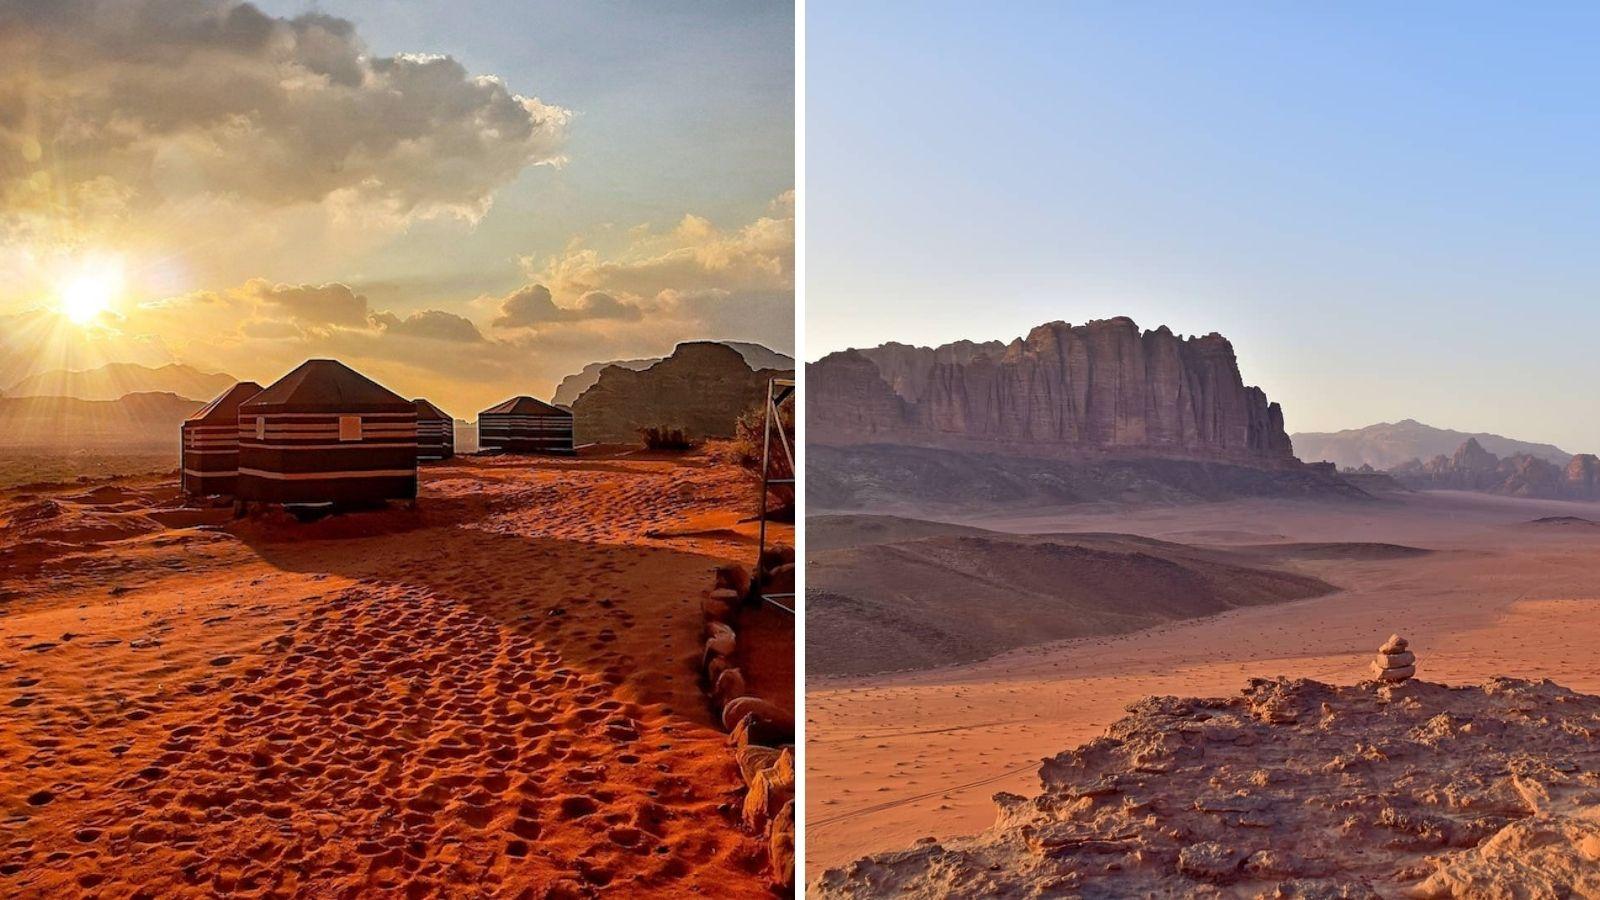 du lịch sao Hỏa ngay tại Wadi Rum Jordan